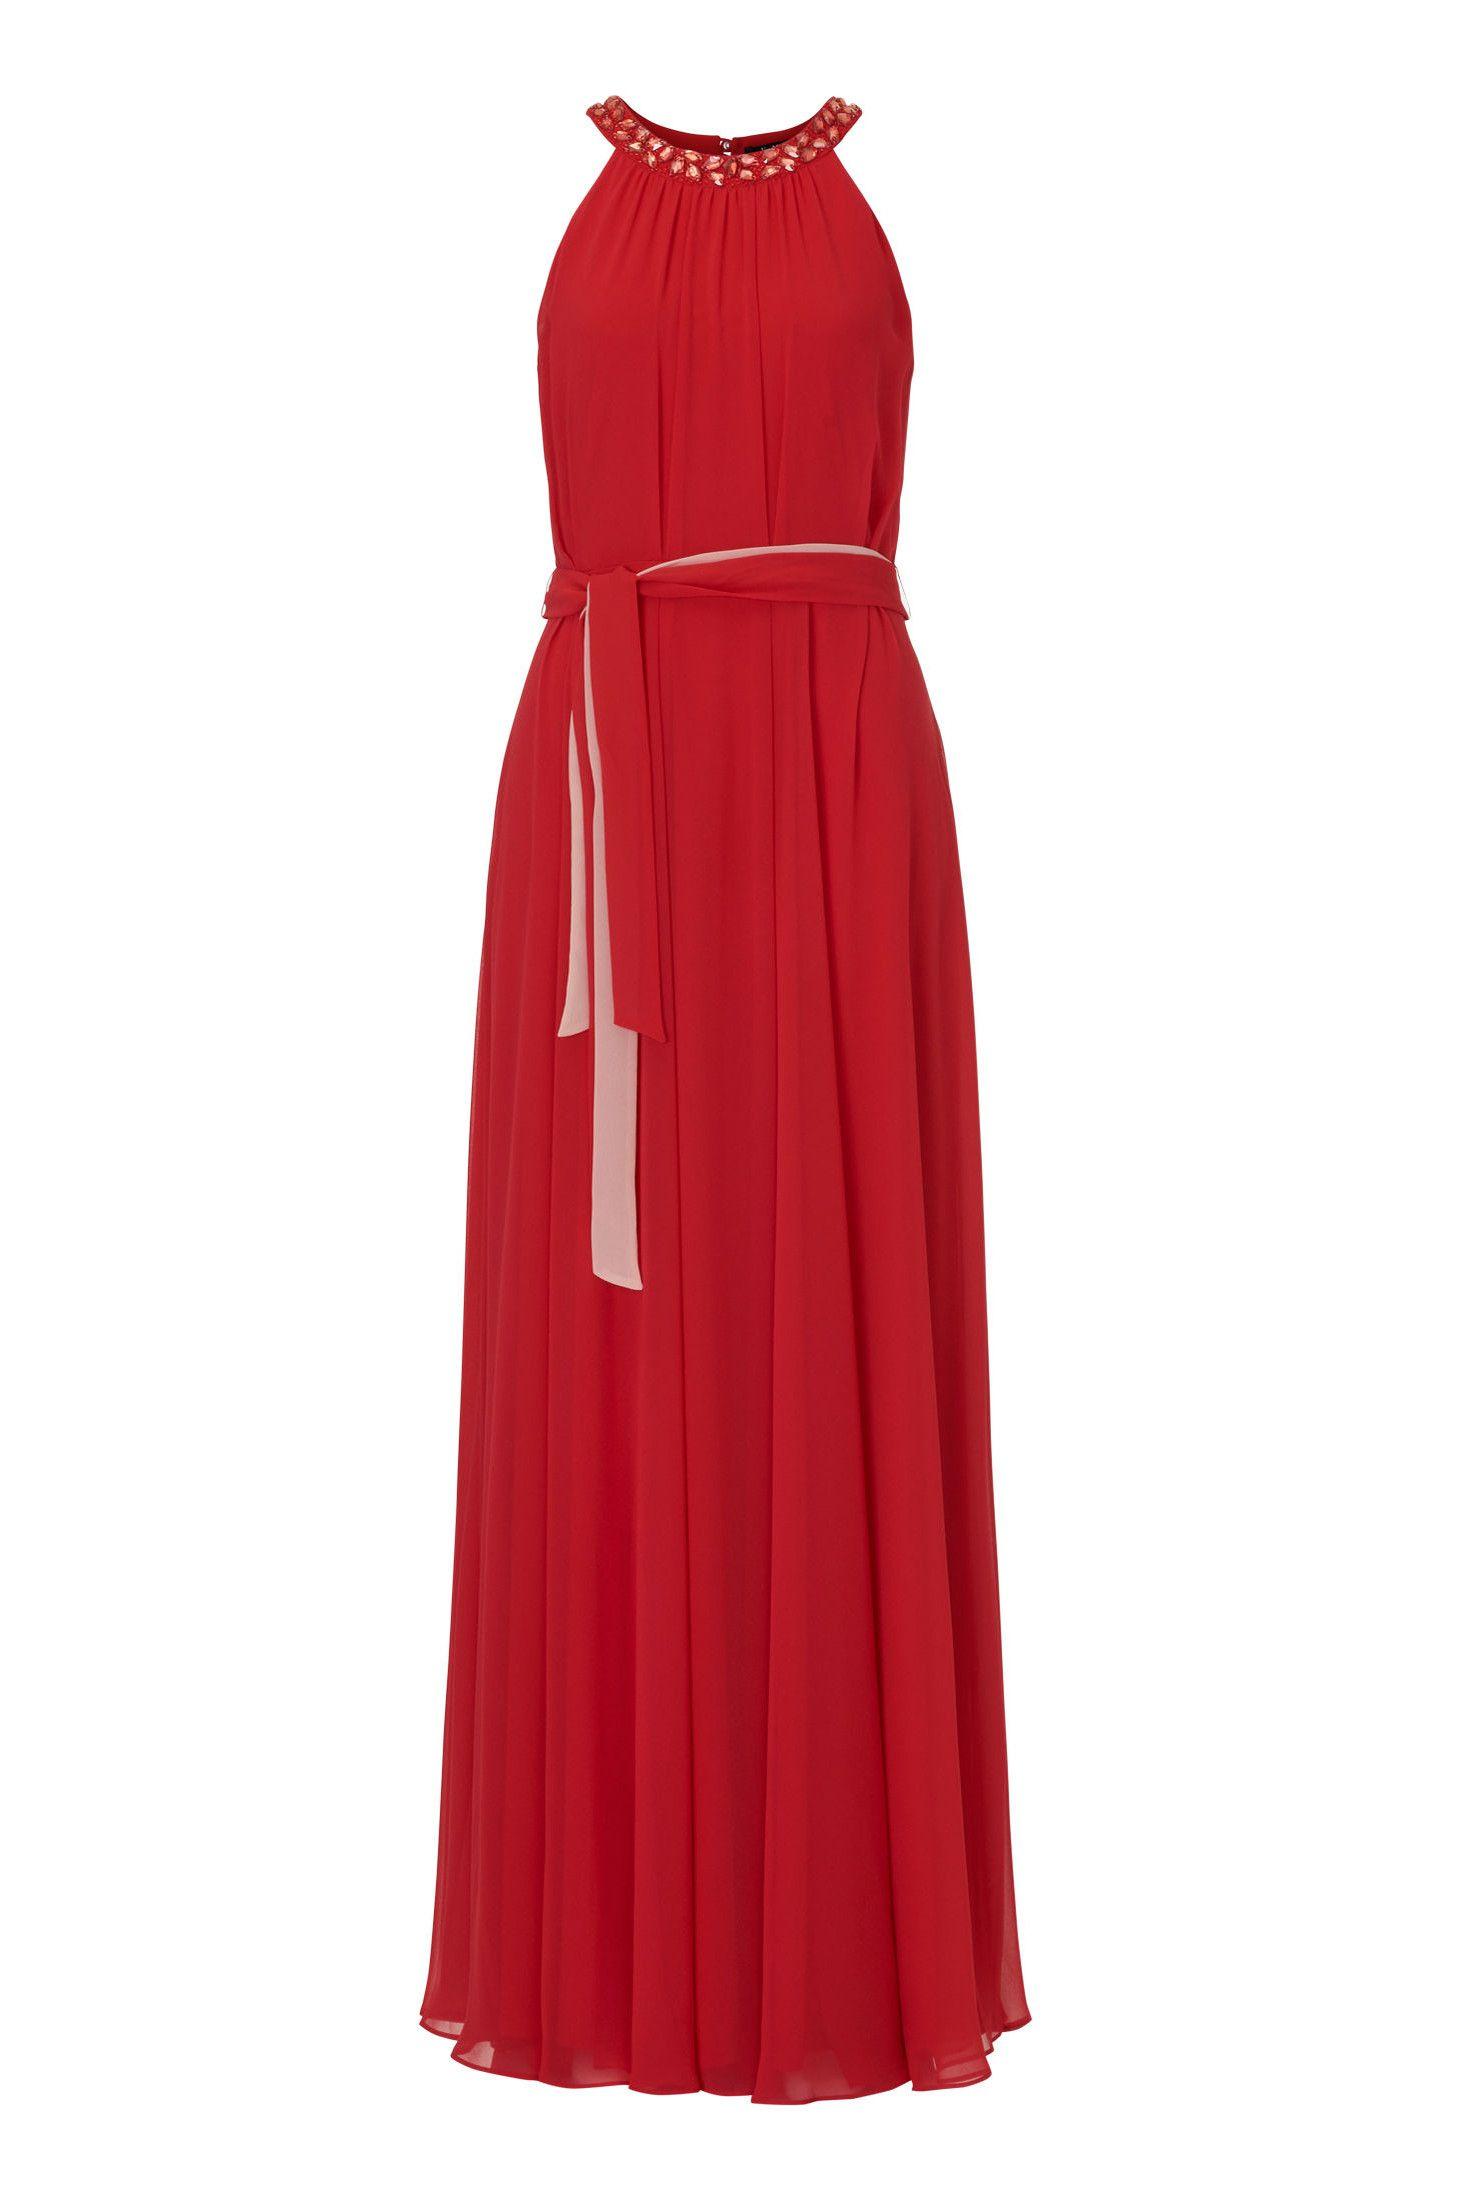 Langes Chiffonkleid Rot Vera Mont  Mode Bösckens  Abendkleid